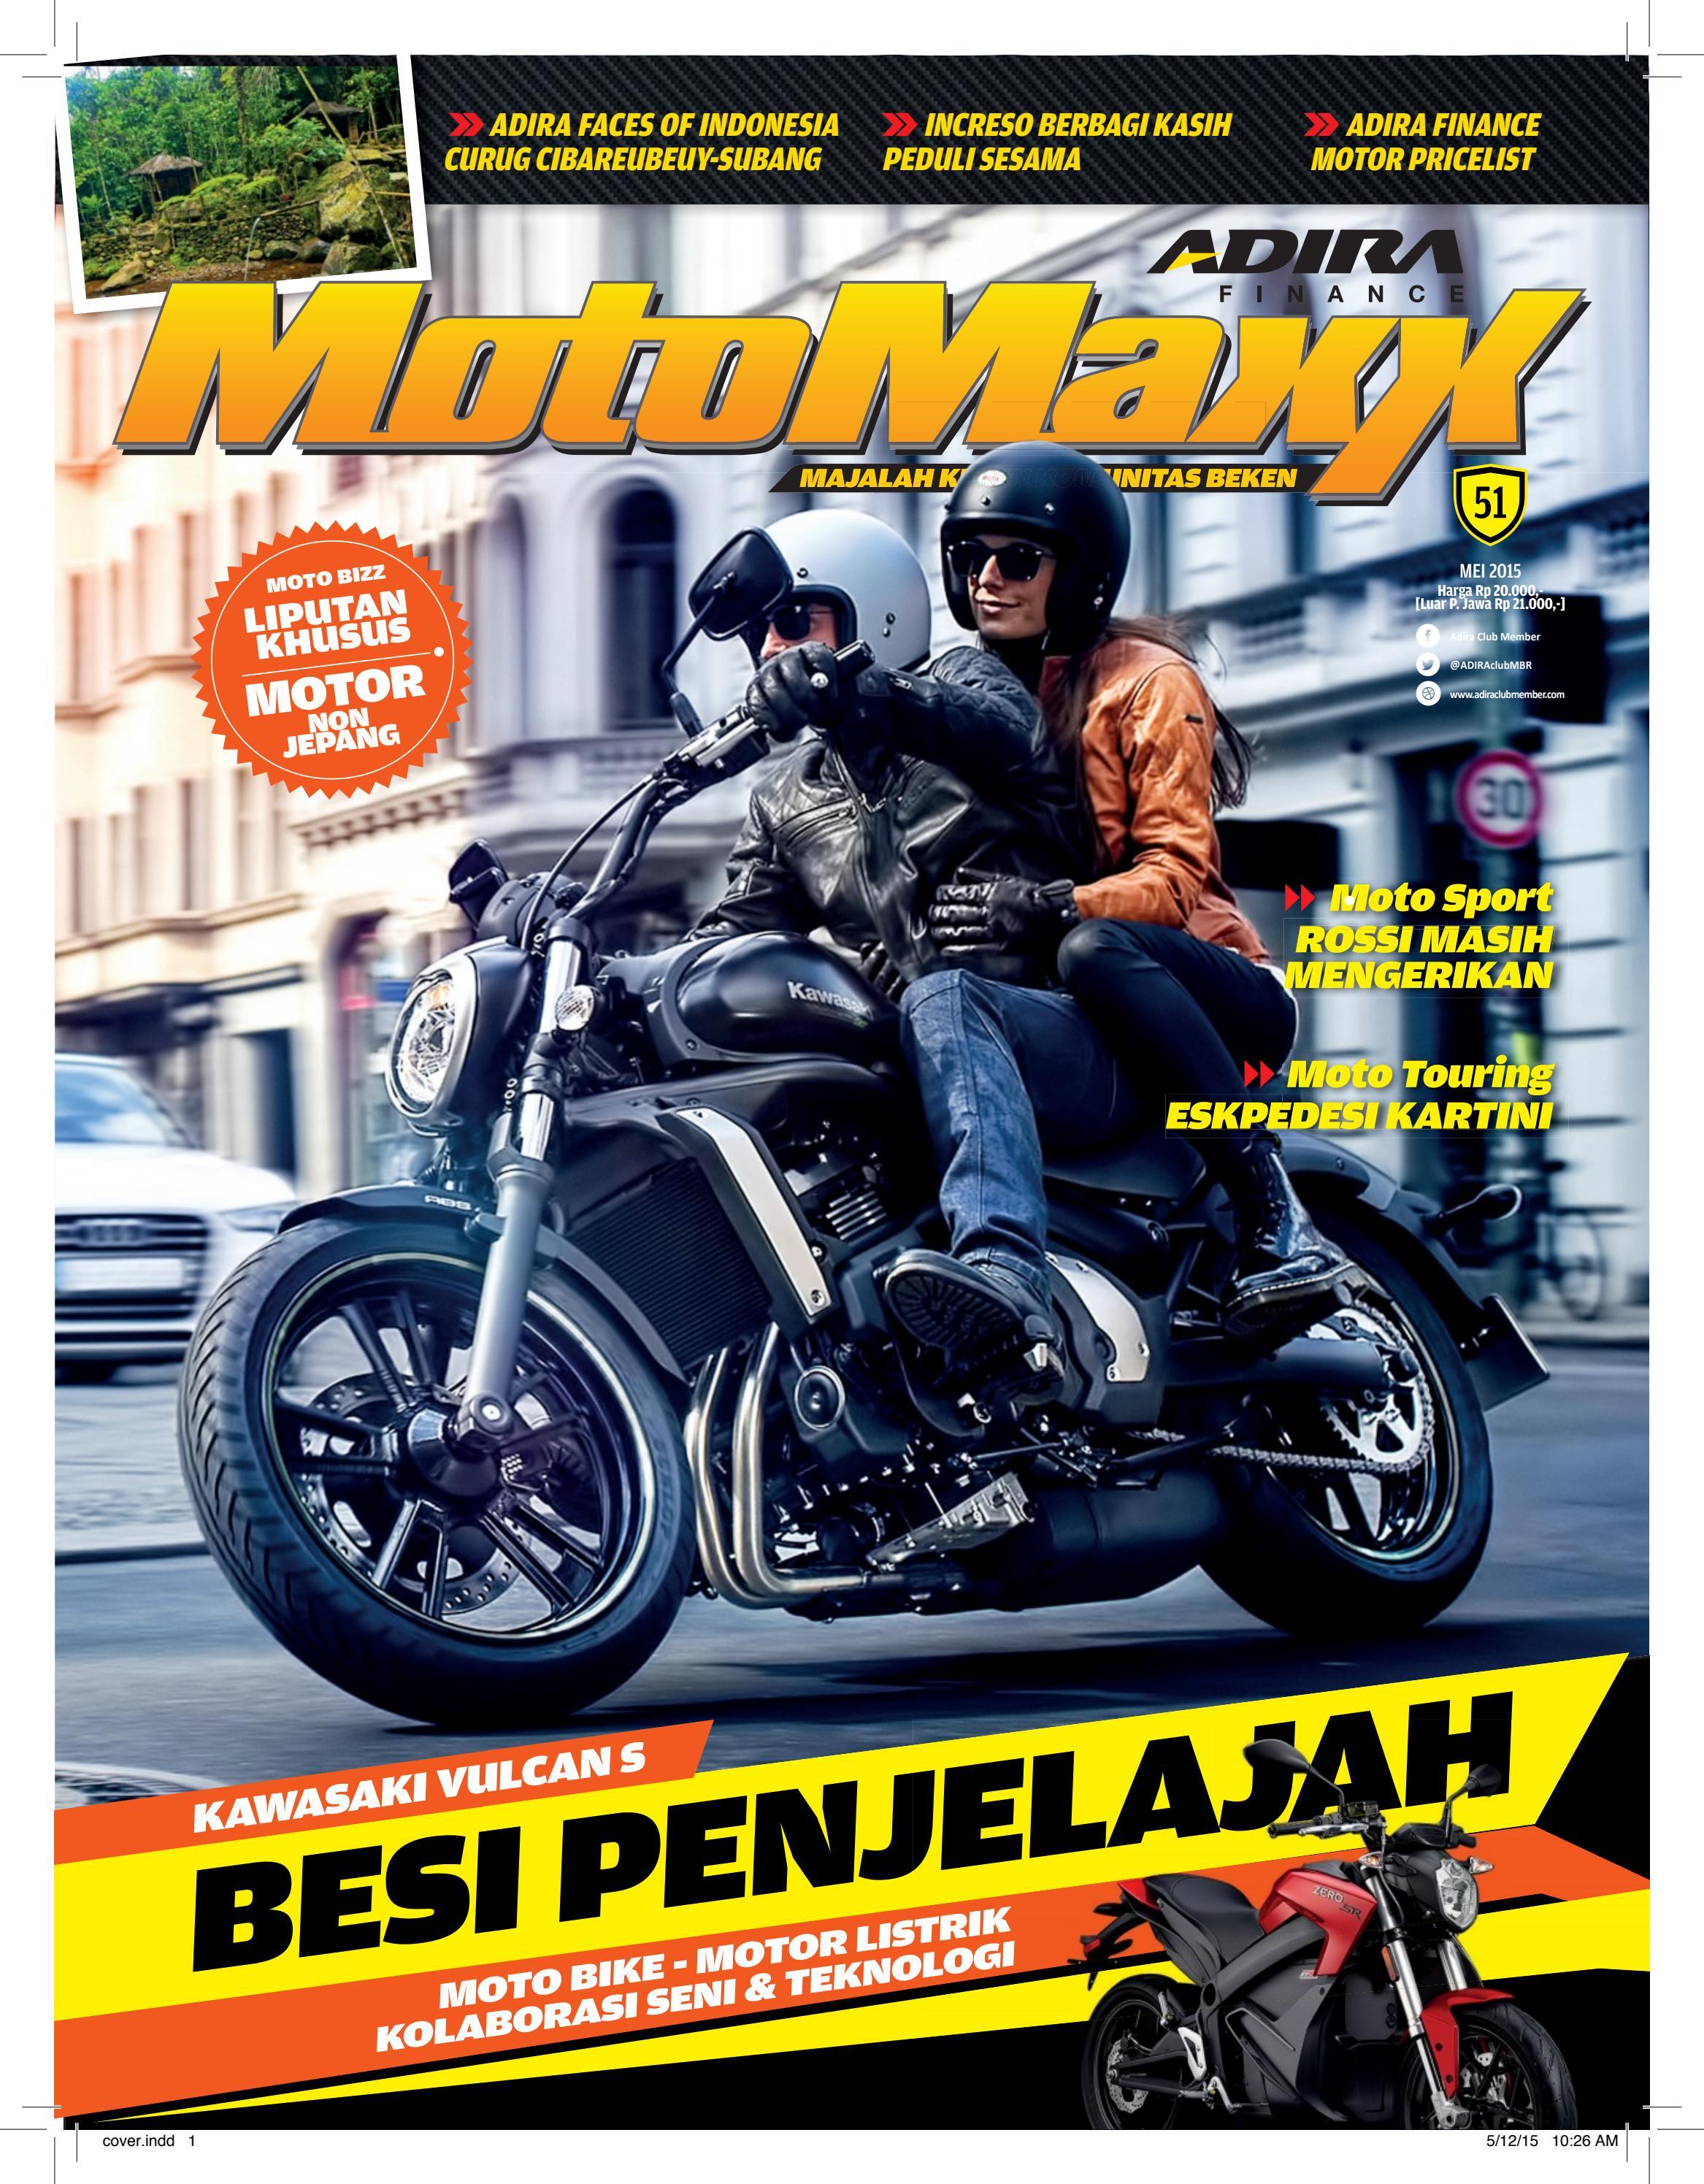 Motomaxx 03 2016 By Adira Member Issuu All New Beat Sporty Esp Cbs Iss Soul Red White Tegal 05 2015